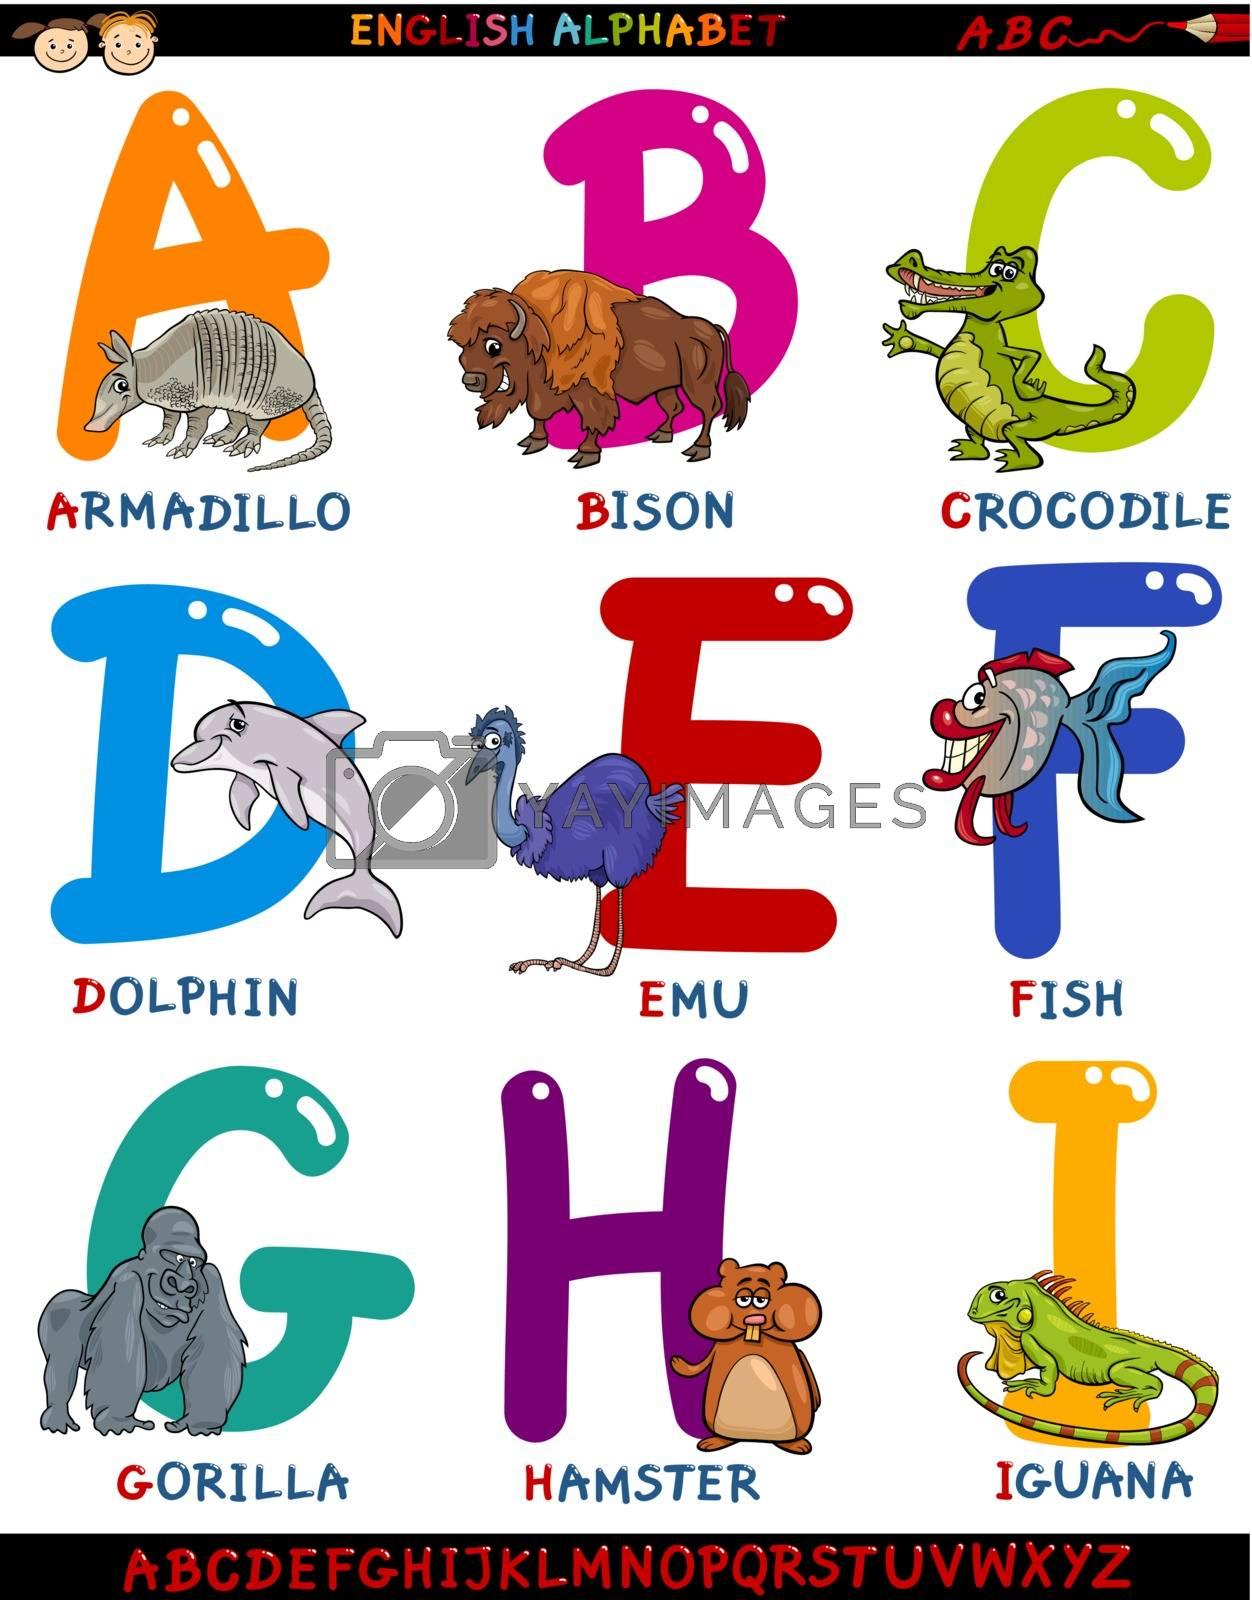 Royalty free image of cartoon english alphabet with animals by izakowski